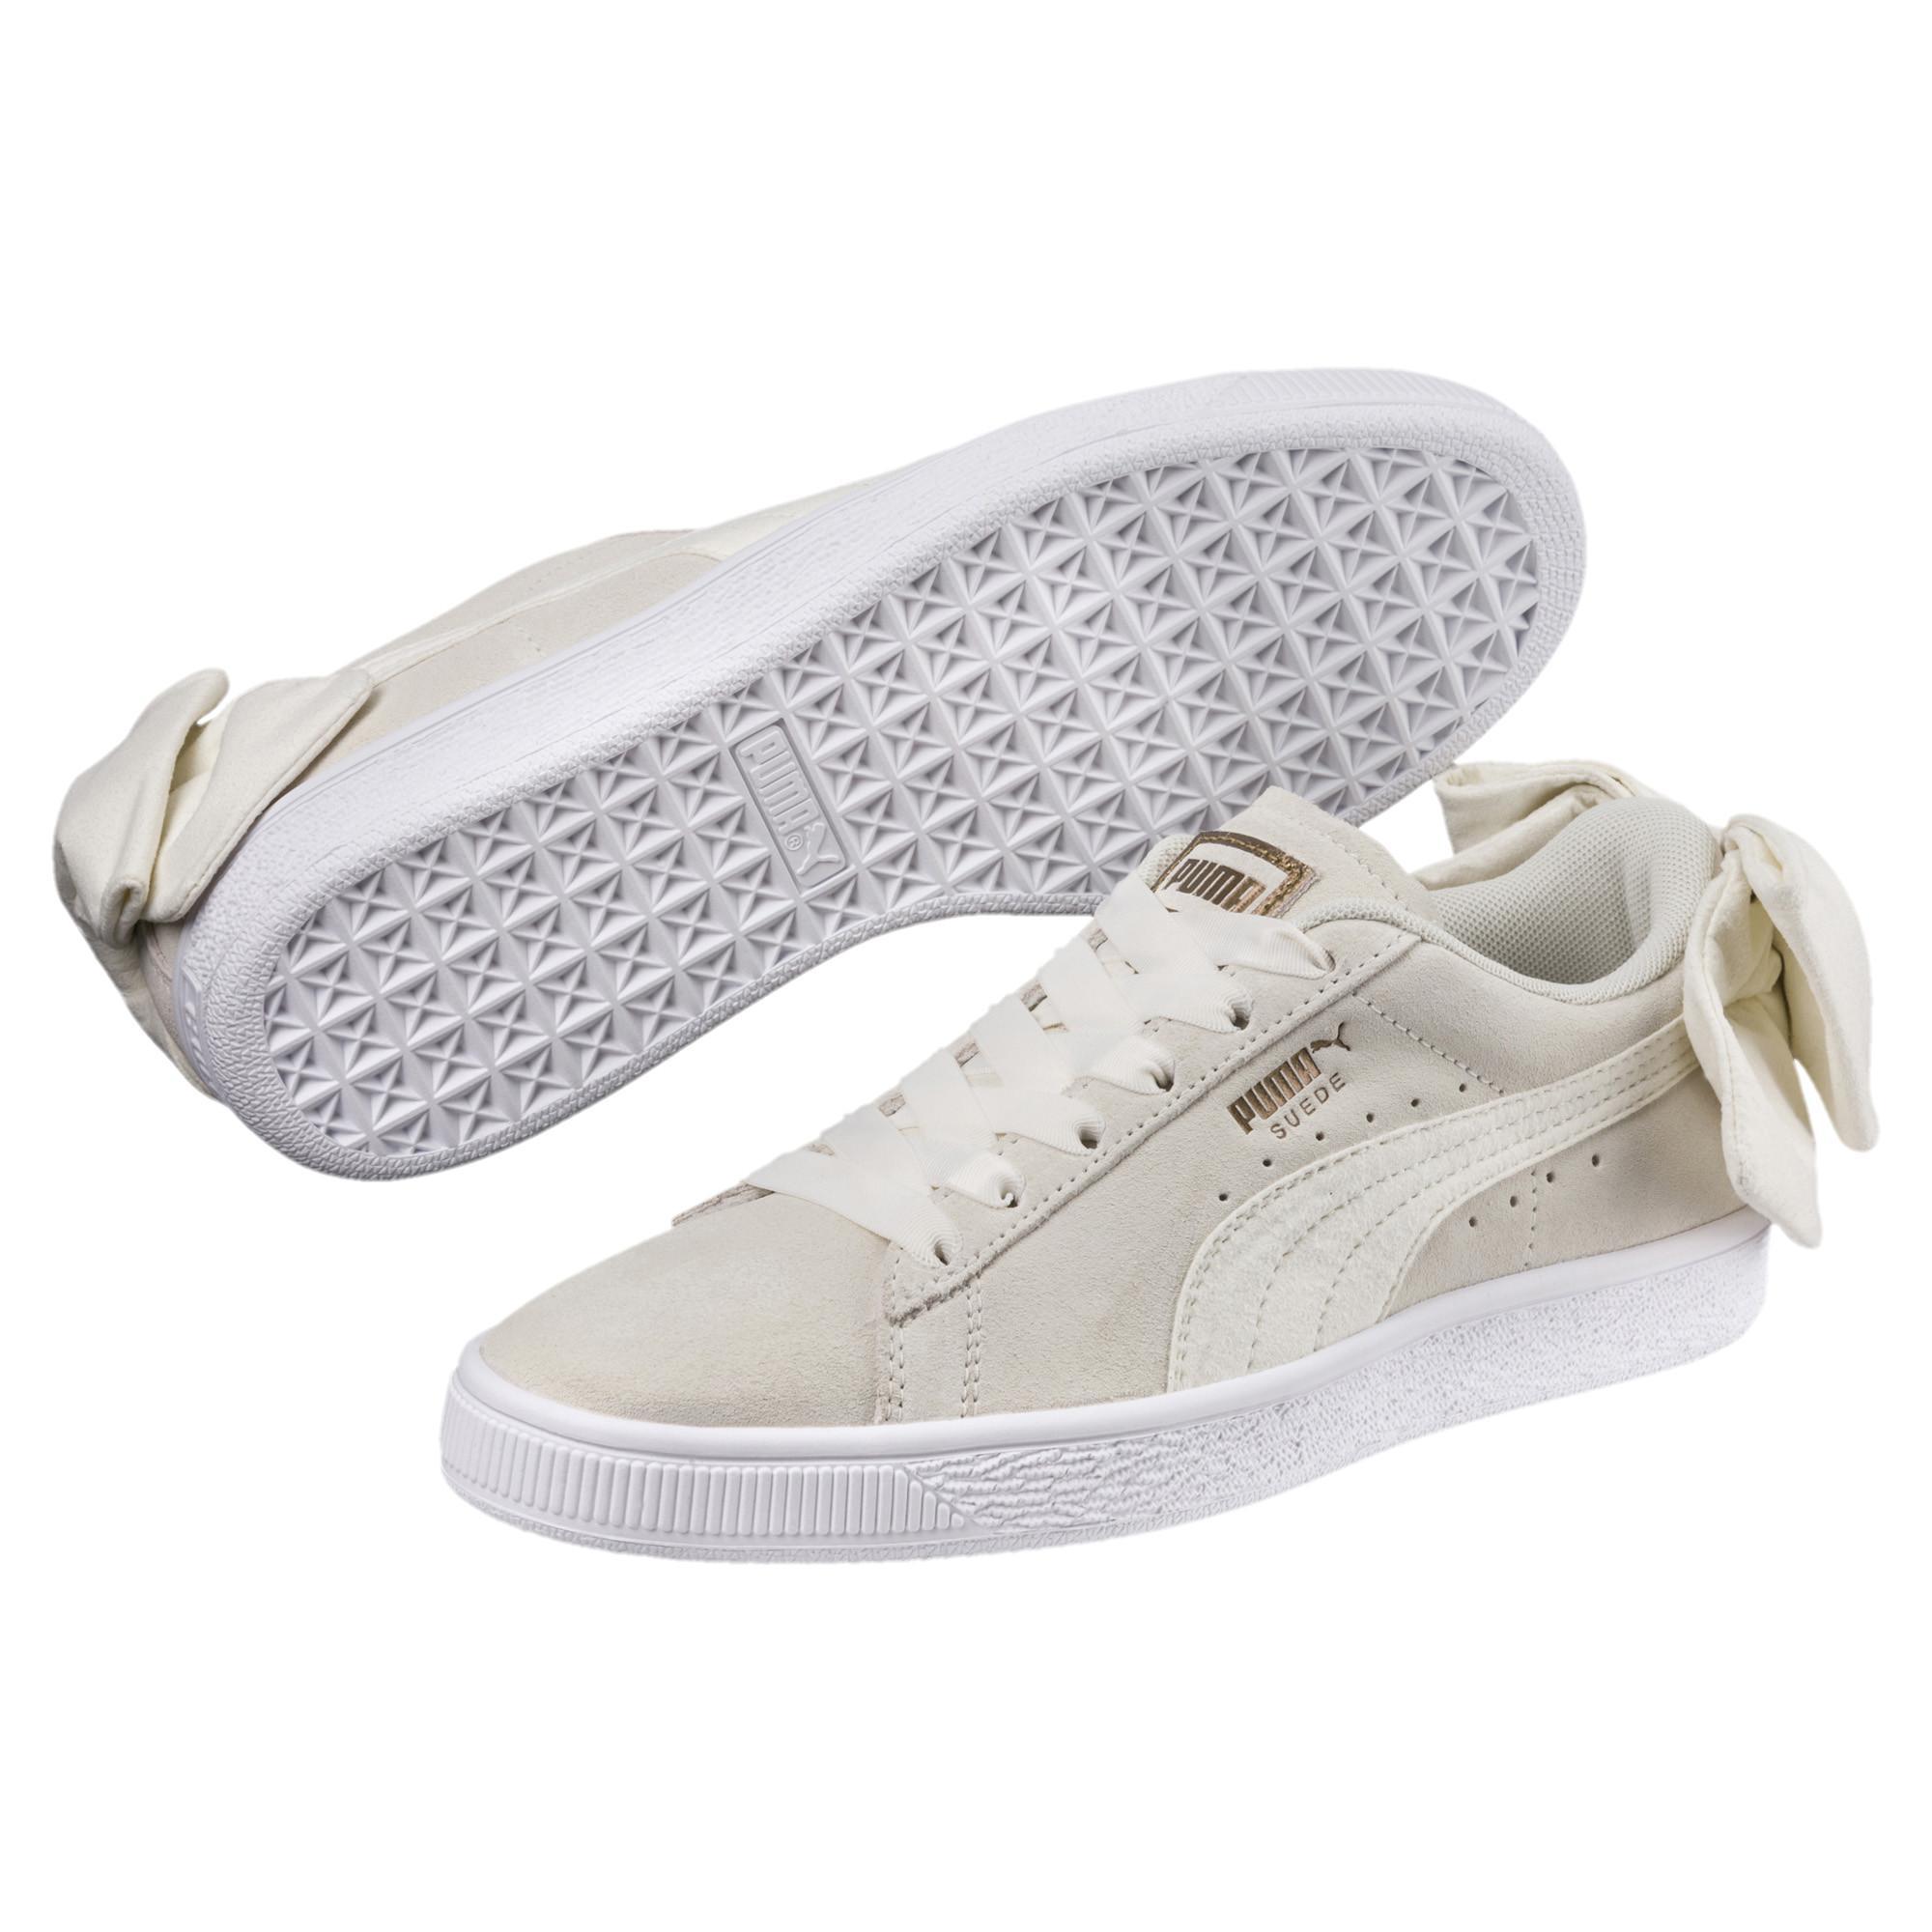 51e9bb70e30 PUMA - White Suede Bow Women s Sneakers - Lyst. View fullscreen